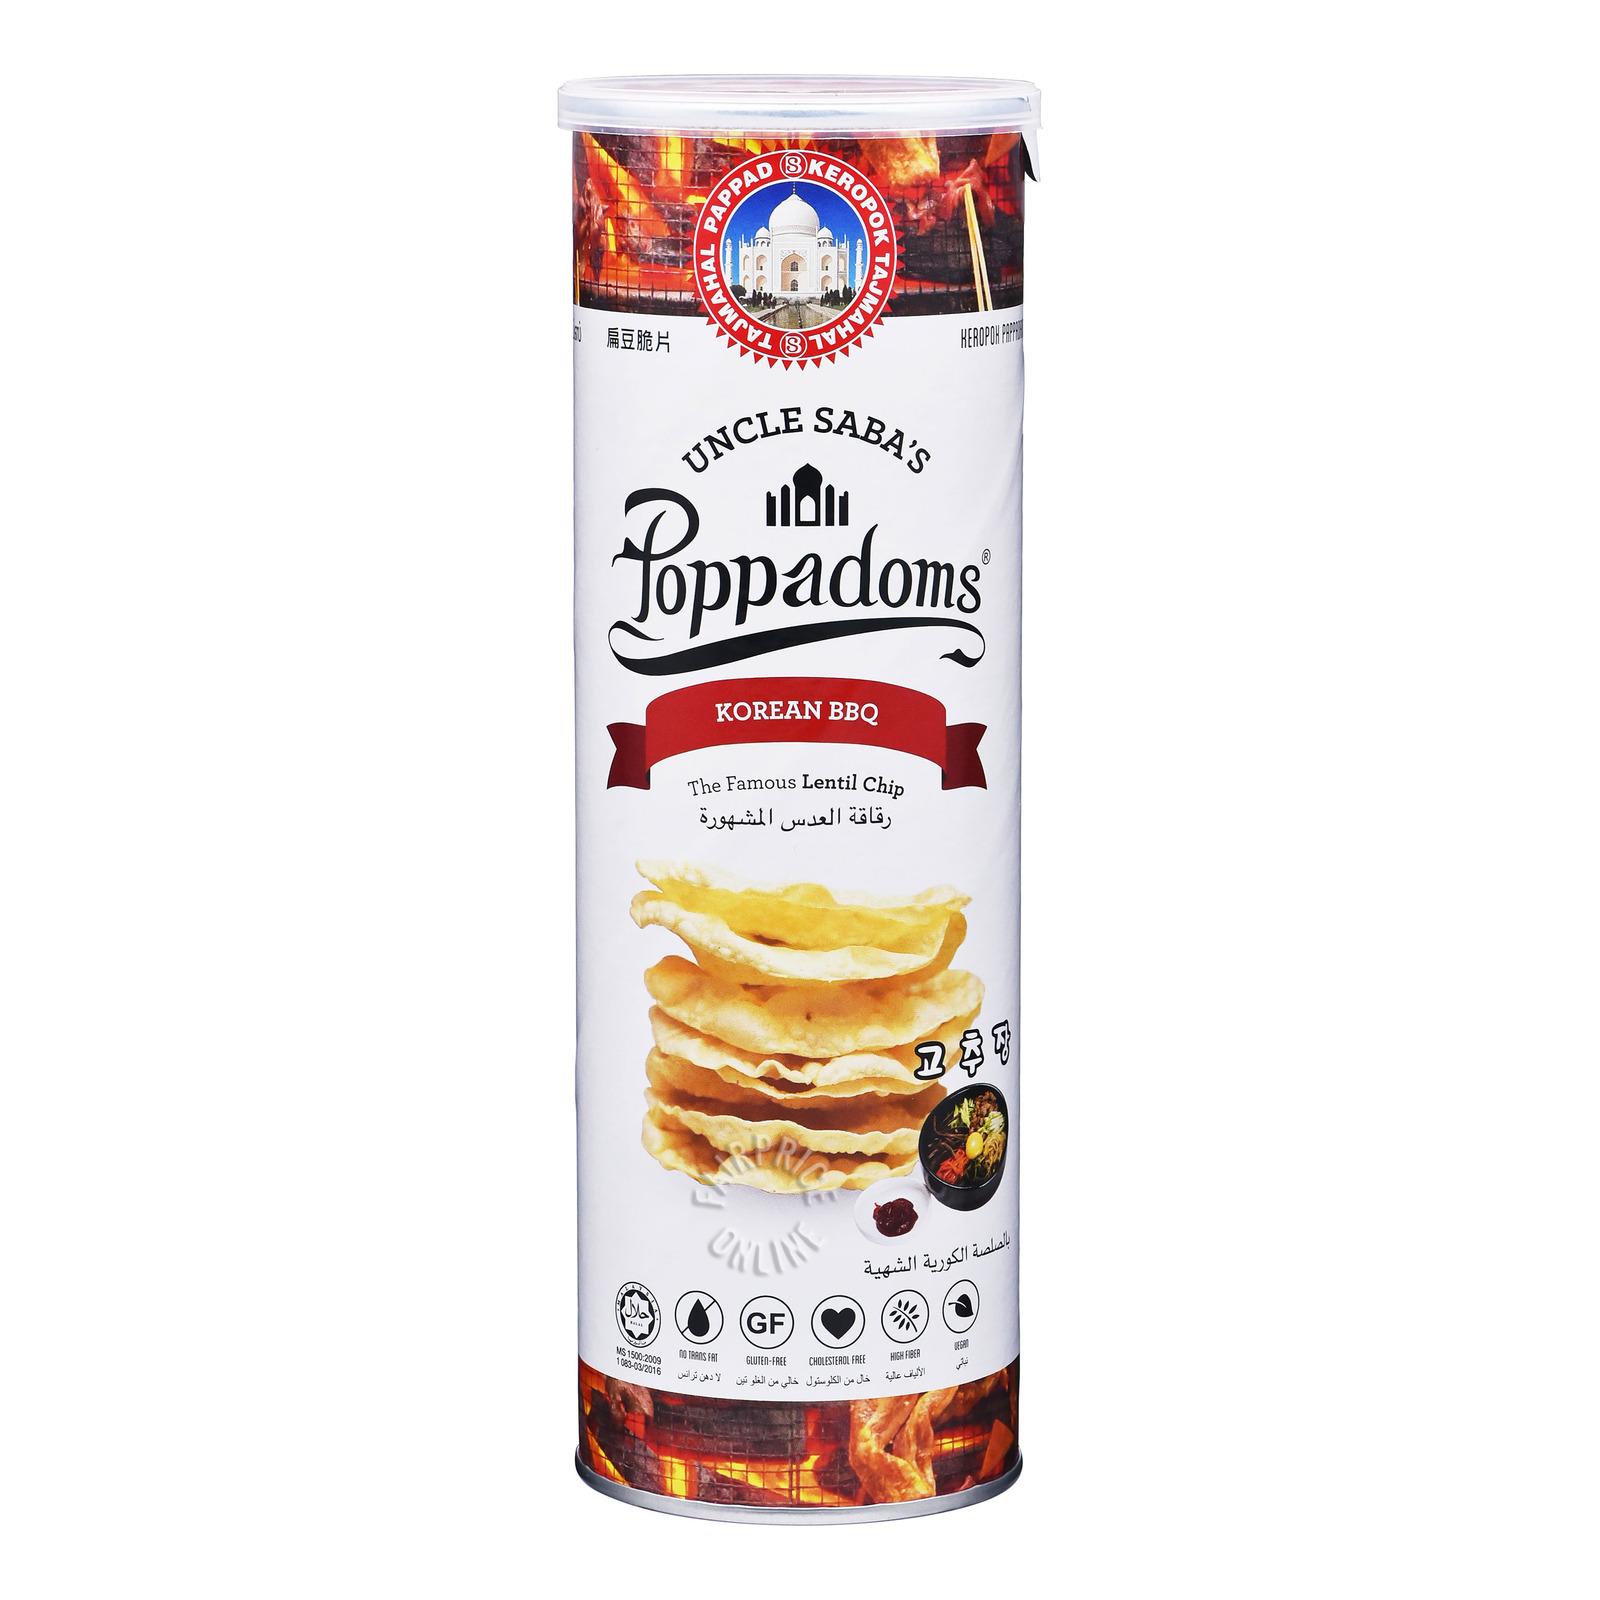 Uncle Saba's Poppadoms Lentil Chip - Barbeque